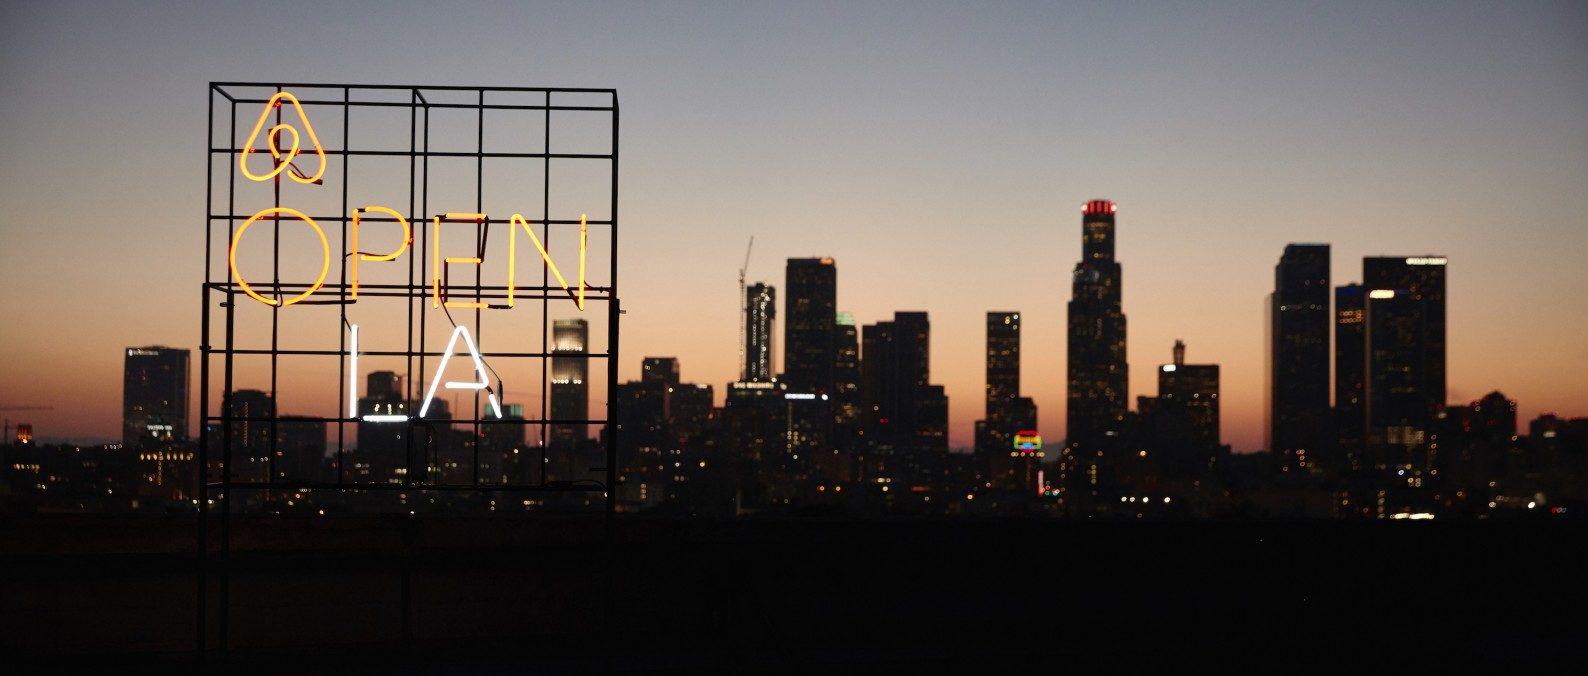 https___press.atairbnb.com_app_uploads_2016_11_LA-OPEN_Elliott_Los-Angeles_20160603_0702-1600x900